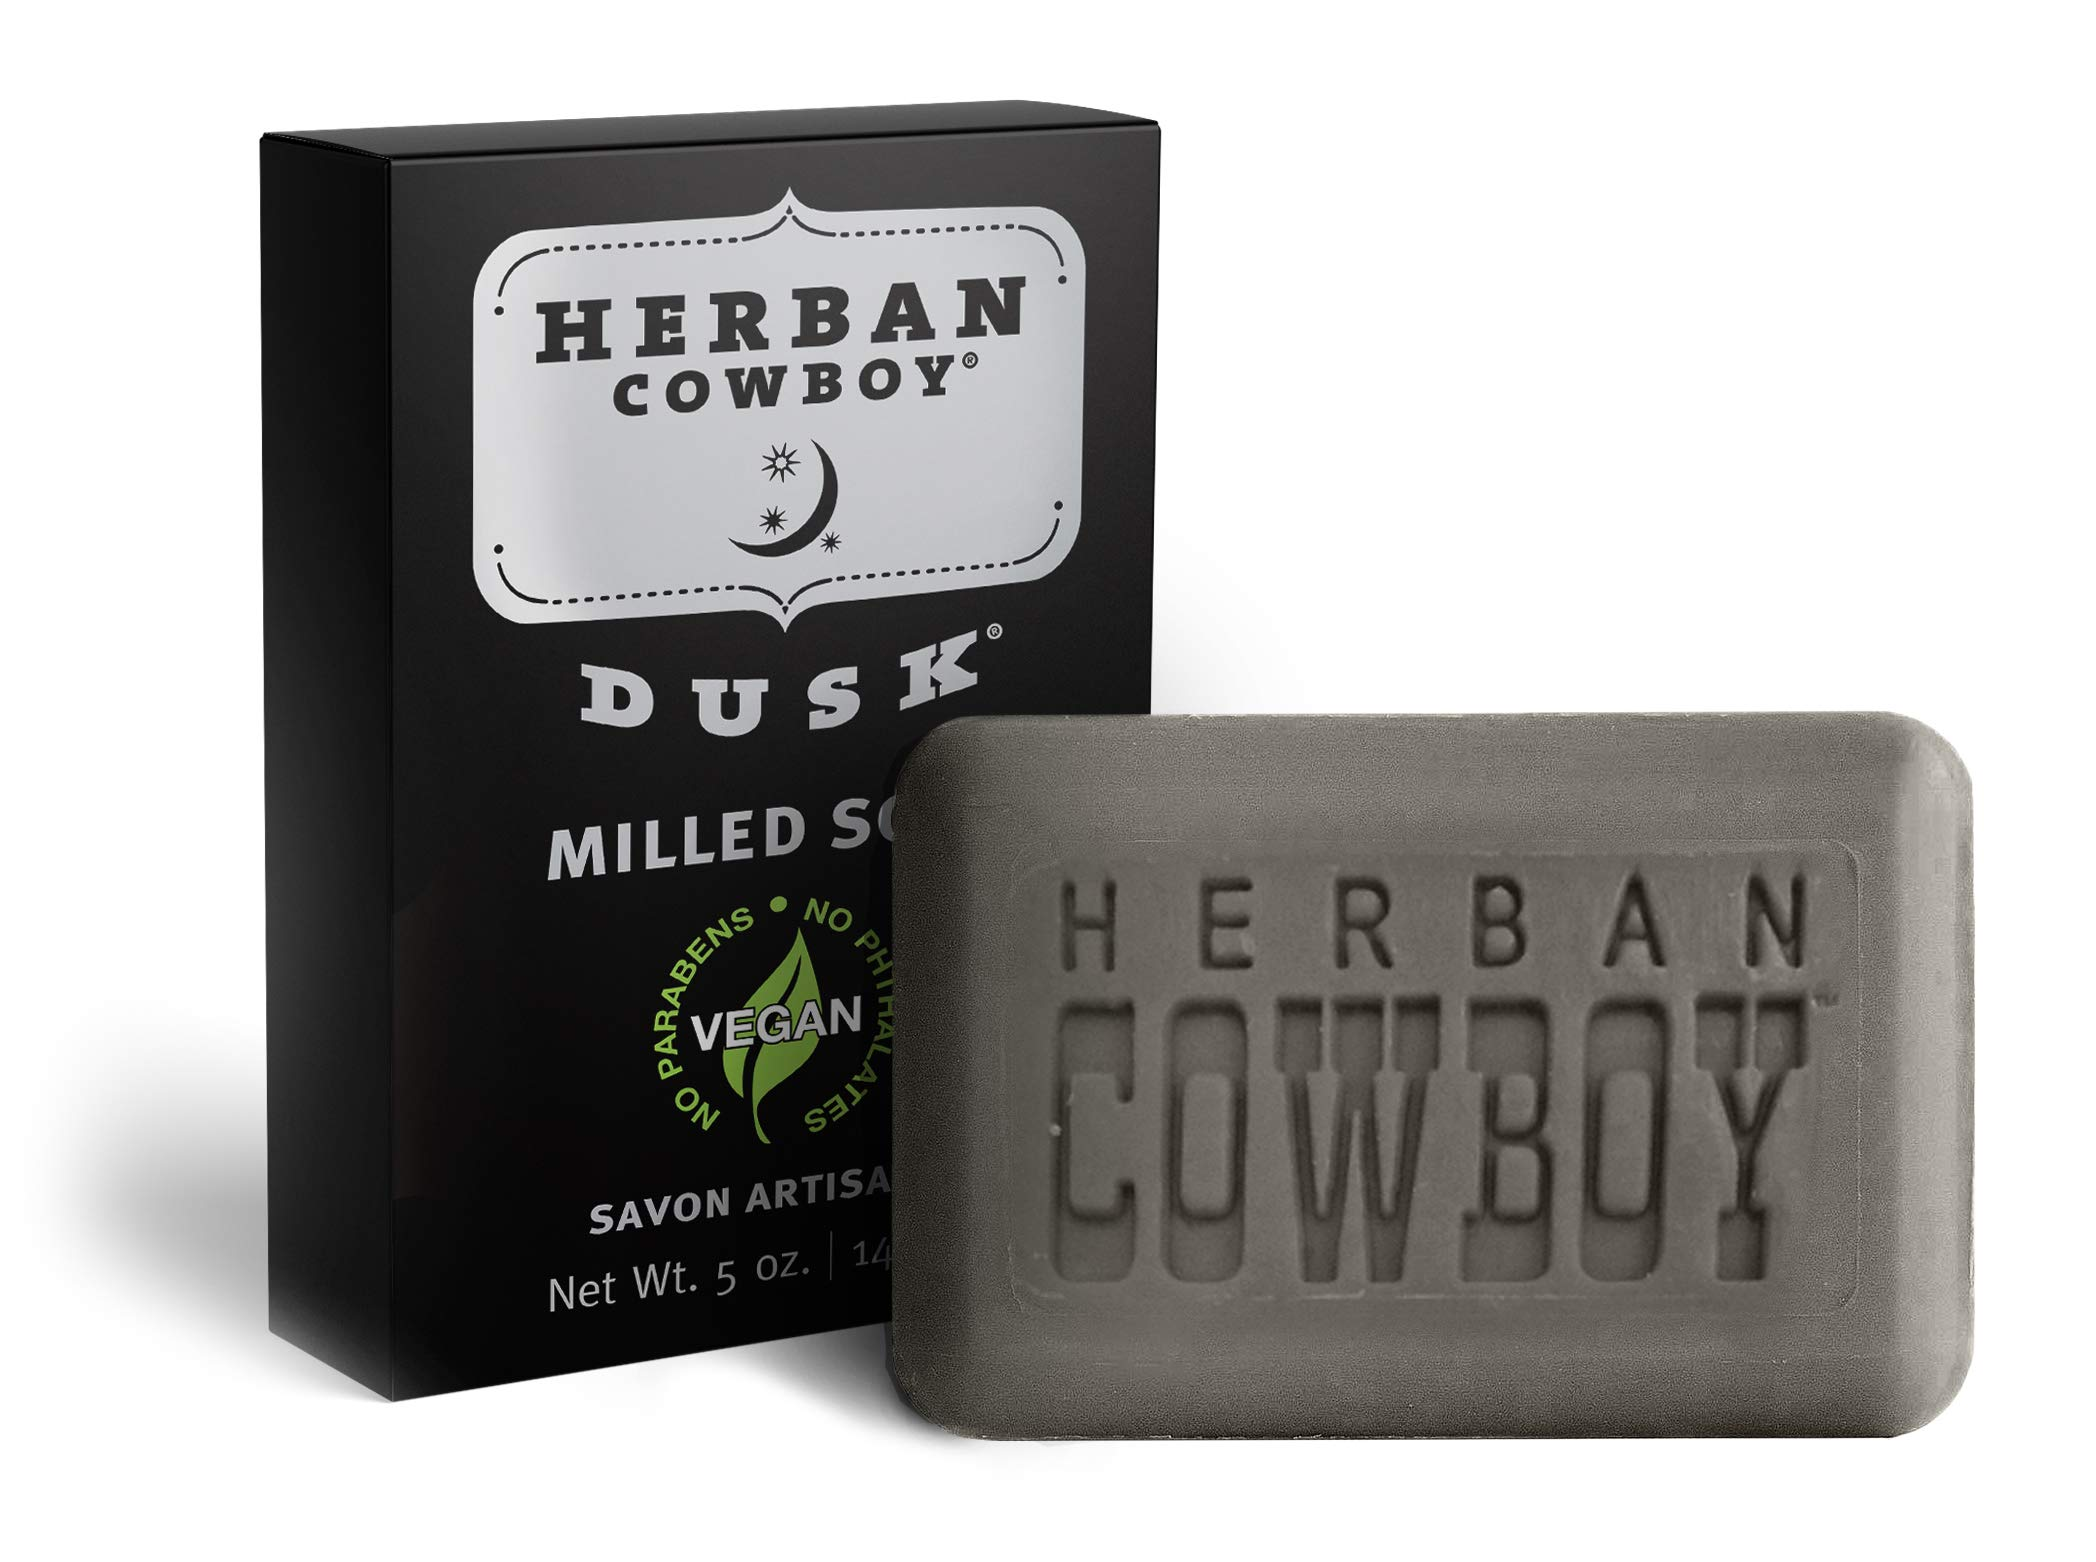 HERBAN COWBOY Milled Bar Soap   Men's Bar Soap   No Parabens, No Phthalates & Certified Vegan … (Dusk)